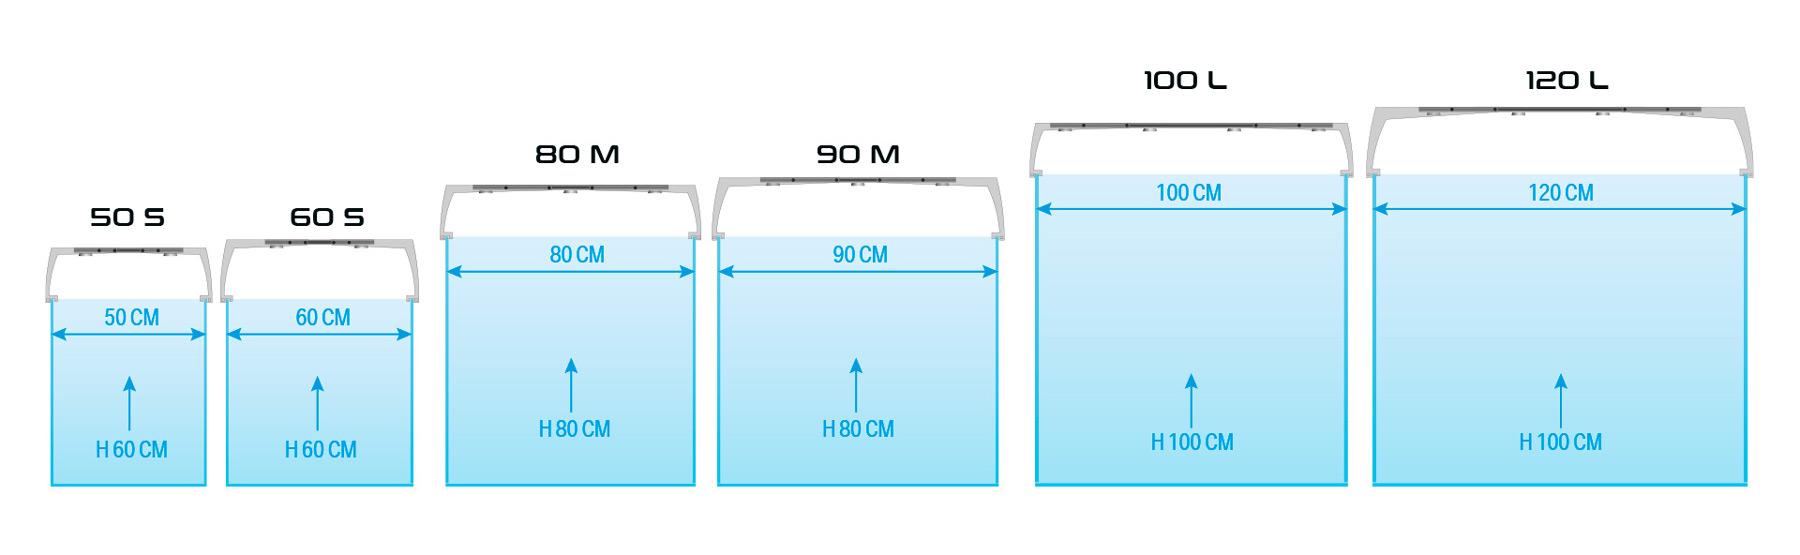 skylight-hyperspot-additional-legs.jpg